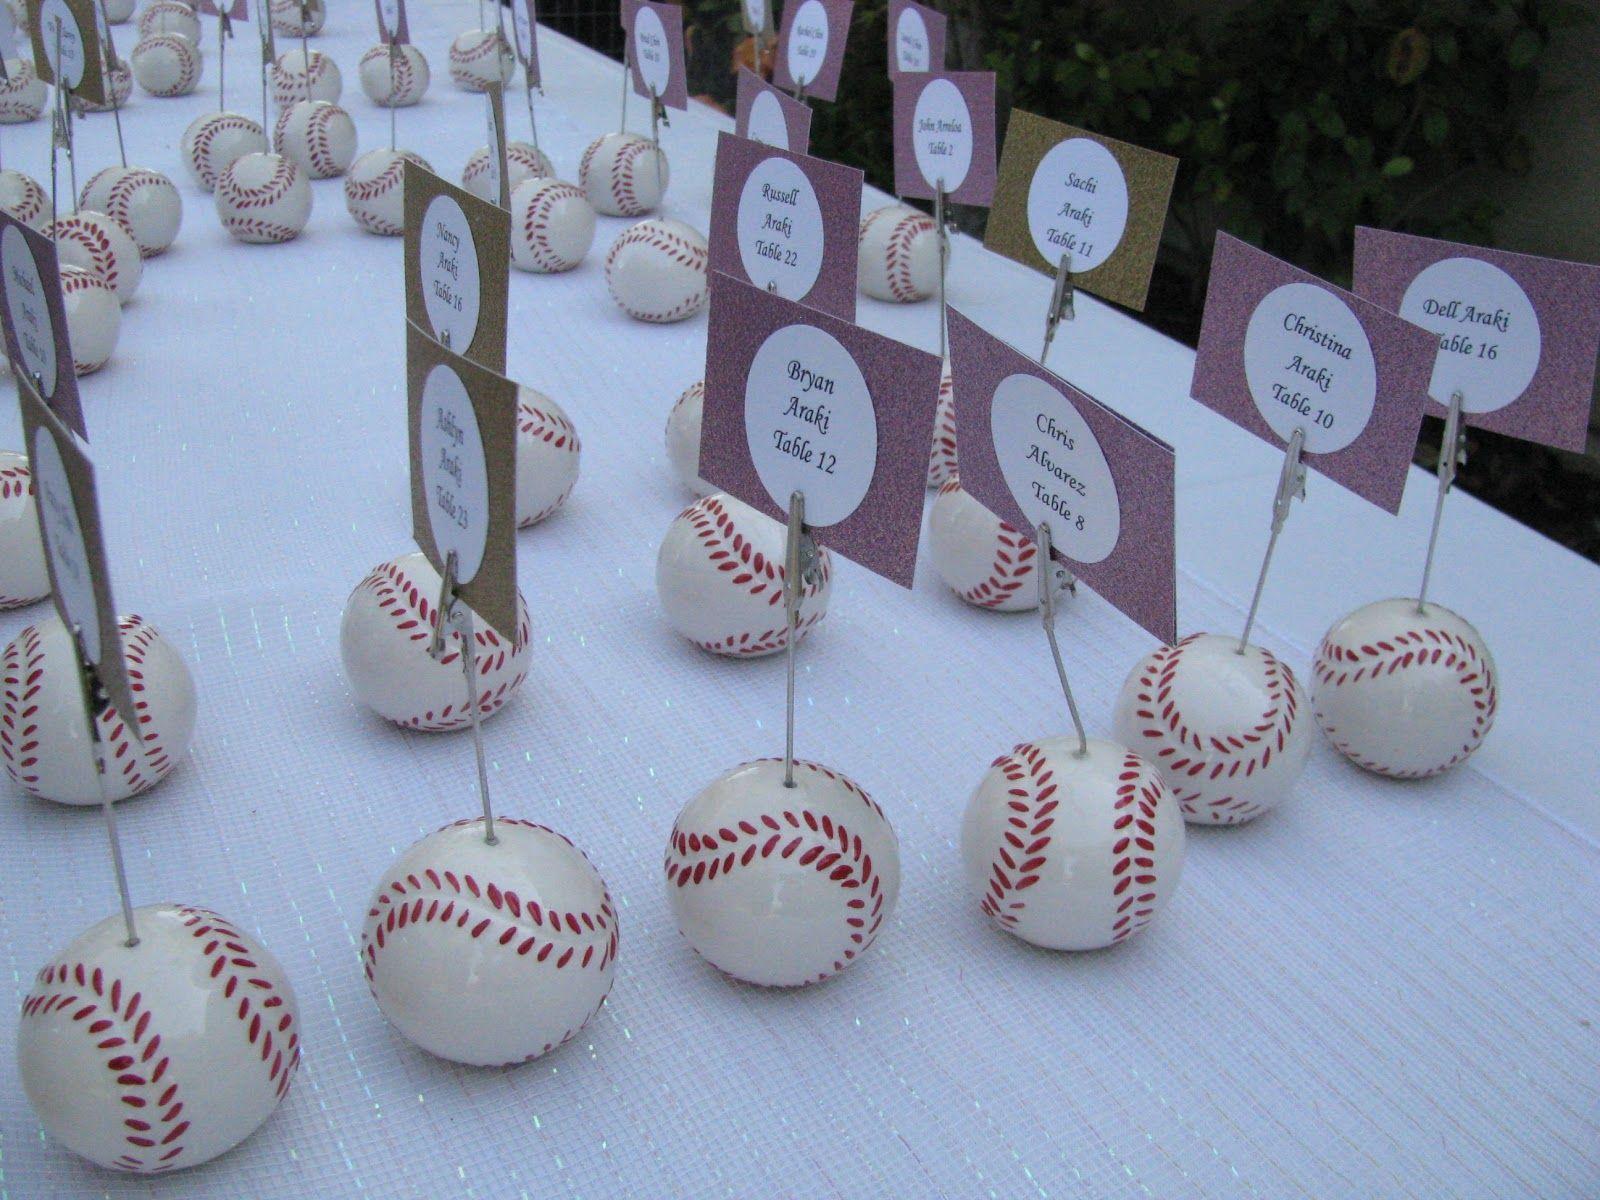 Baseball Wedding Gifts: Baseball Theme Wedding Ideas